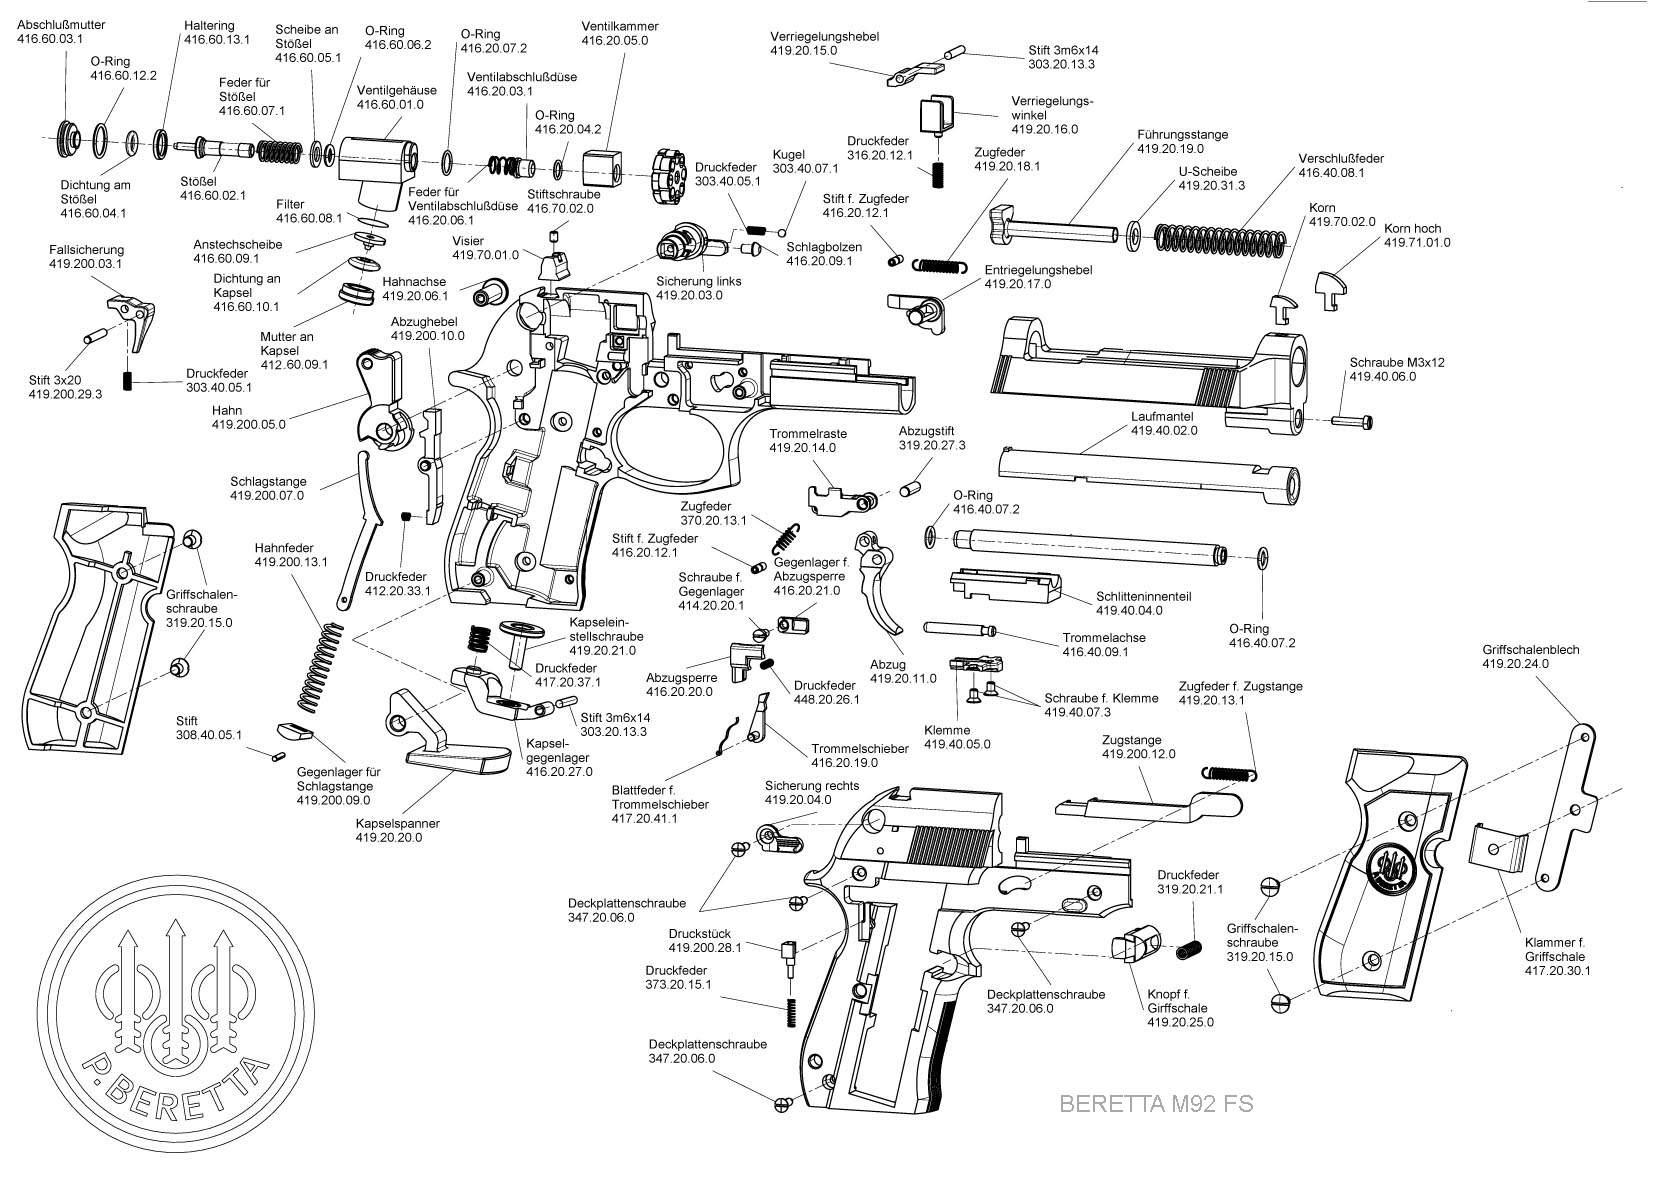 pistolet beretta 92fs noir